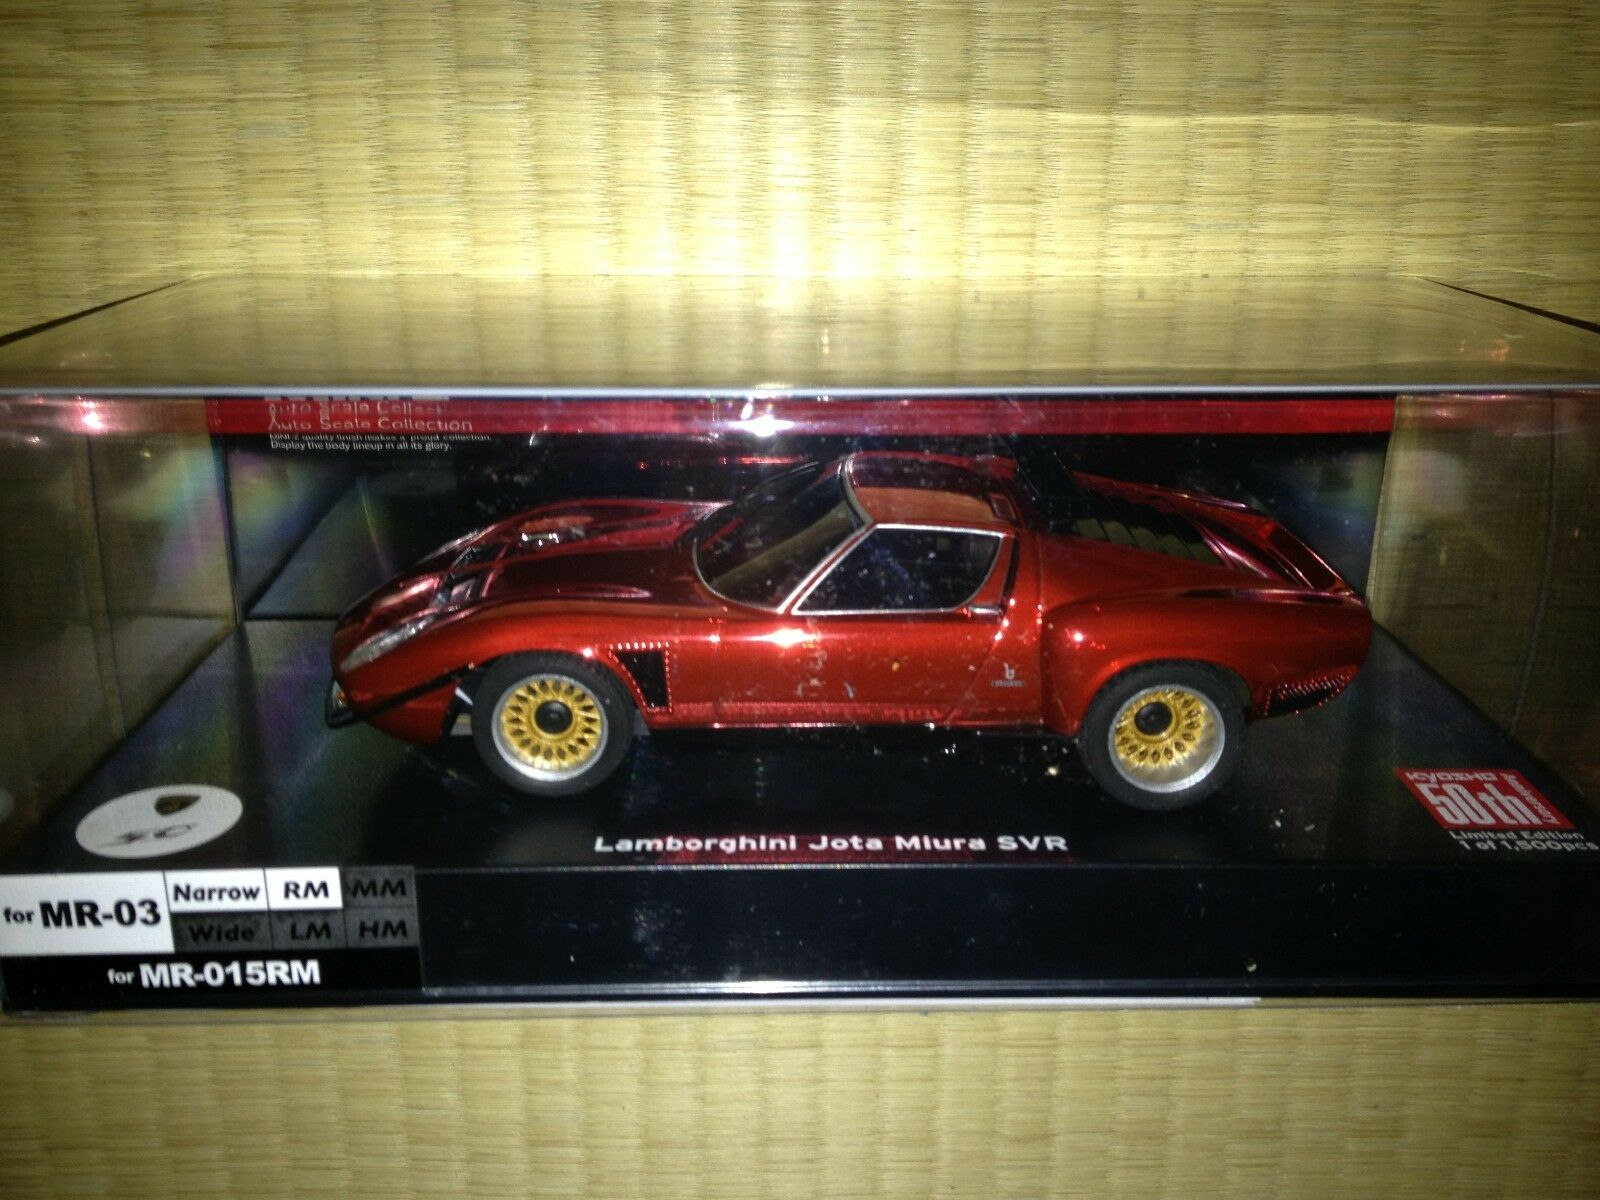 KYOSHO Mini Z Lamborghini Miura Jota SVR 50th Anniversary MZP36CR Limited 1500